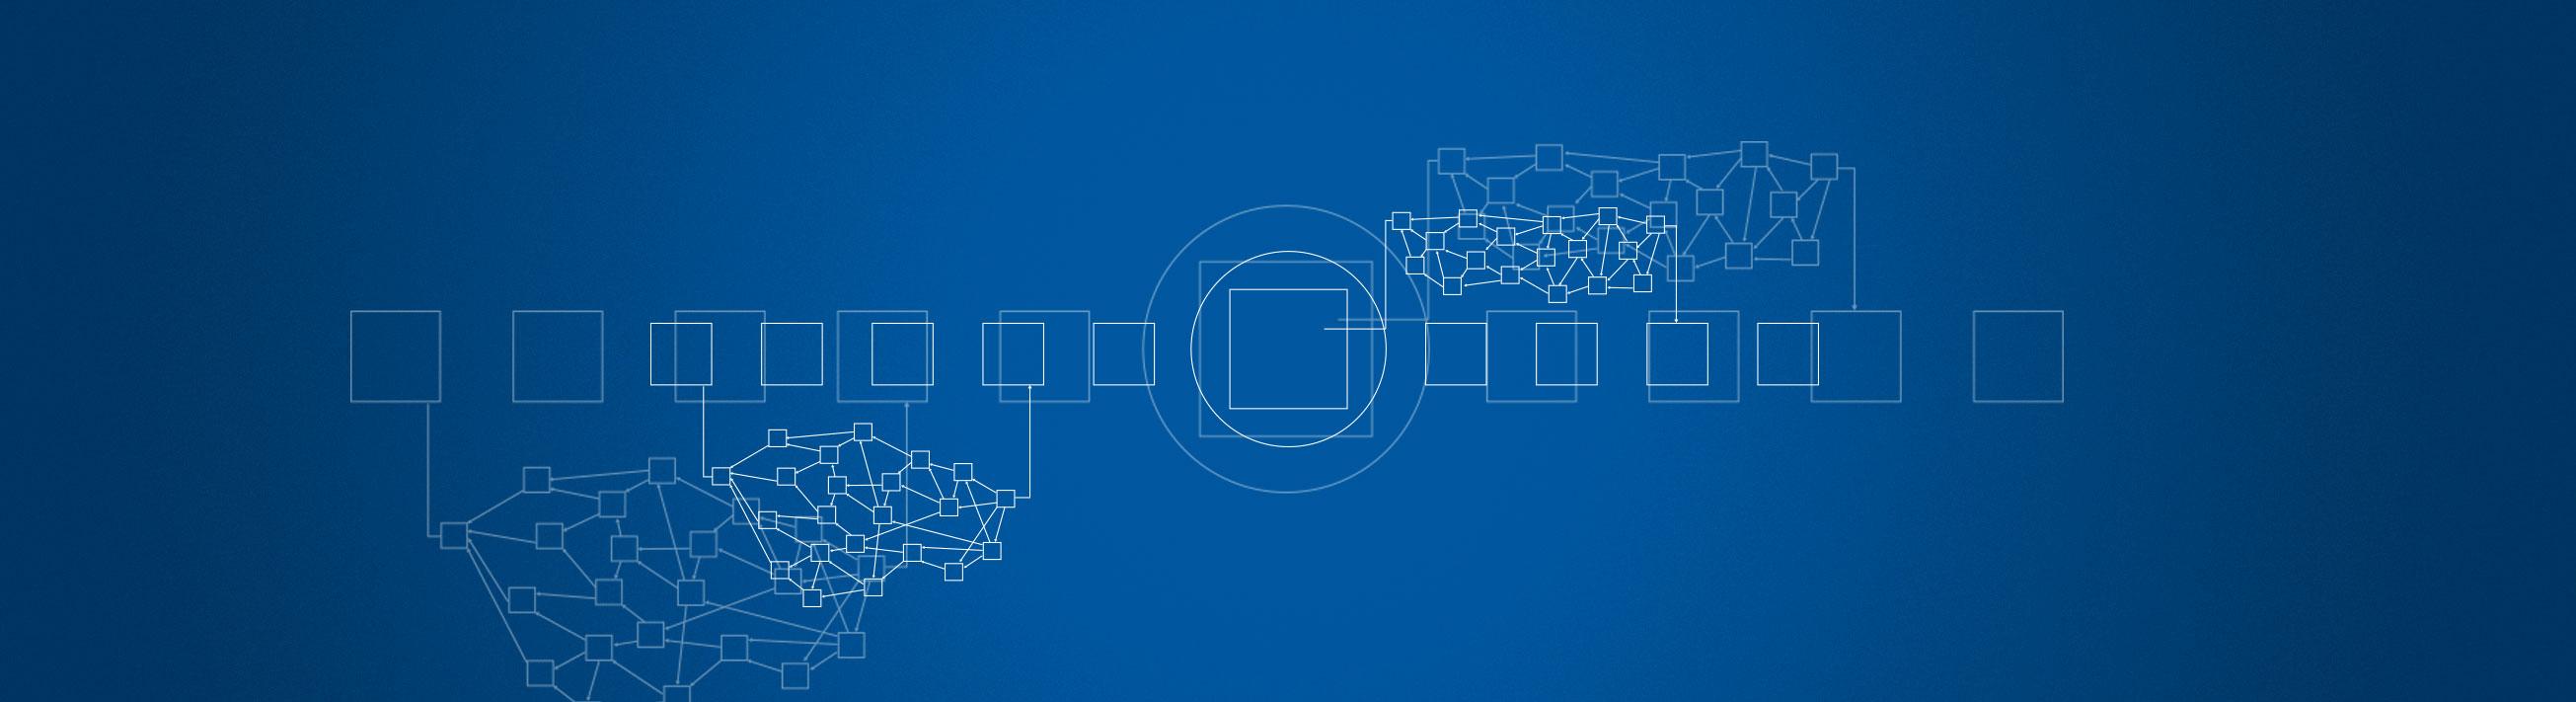 Investing in blockchain alternatives Pt I: Hedera Hashgraph